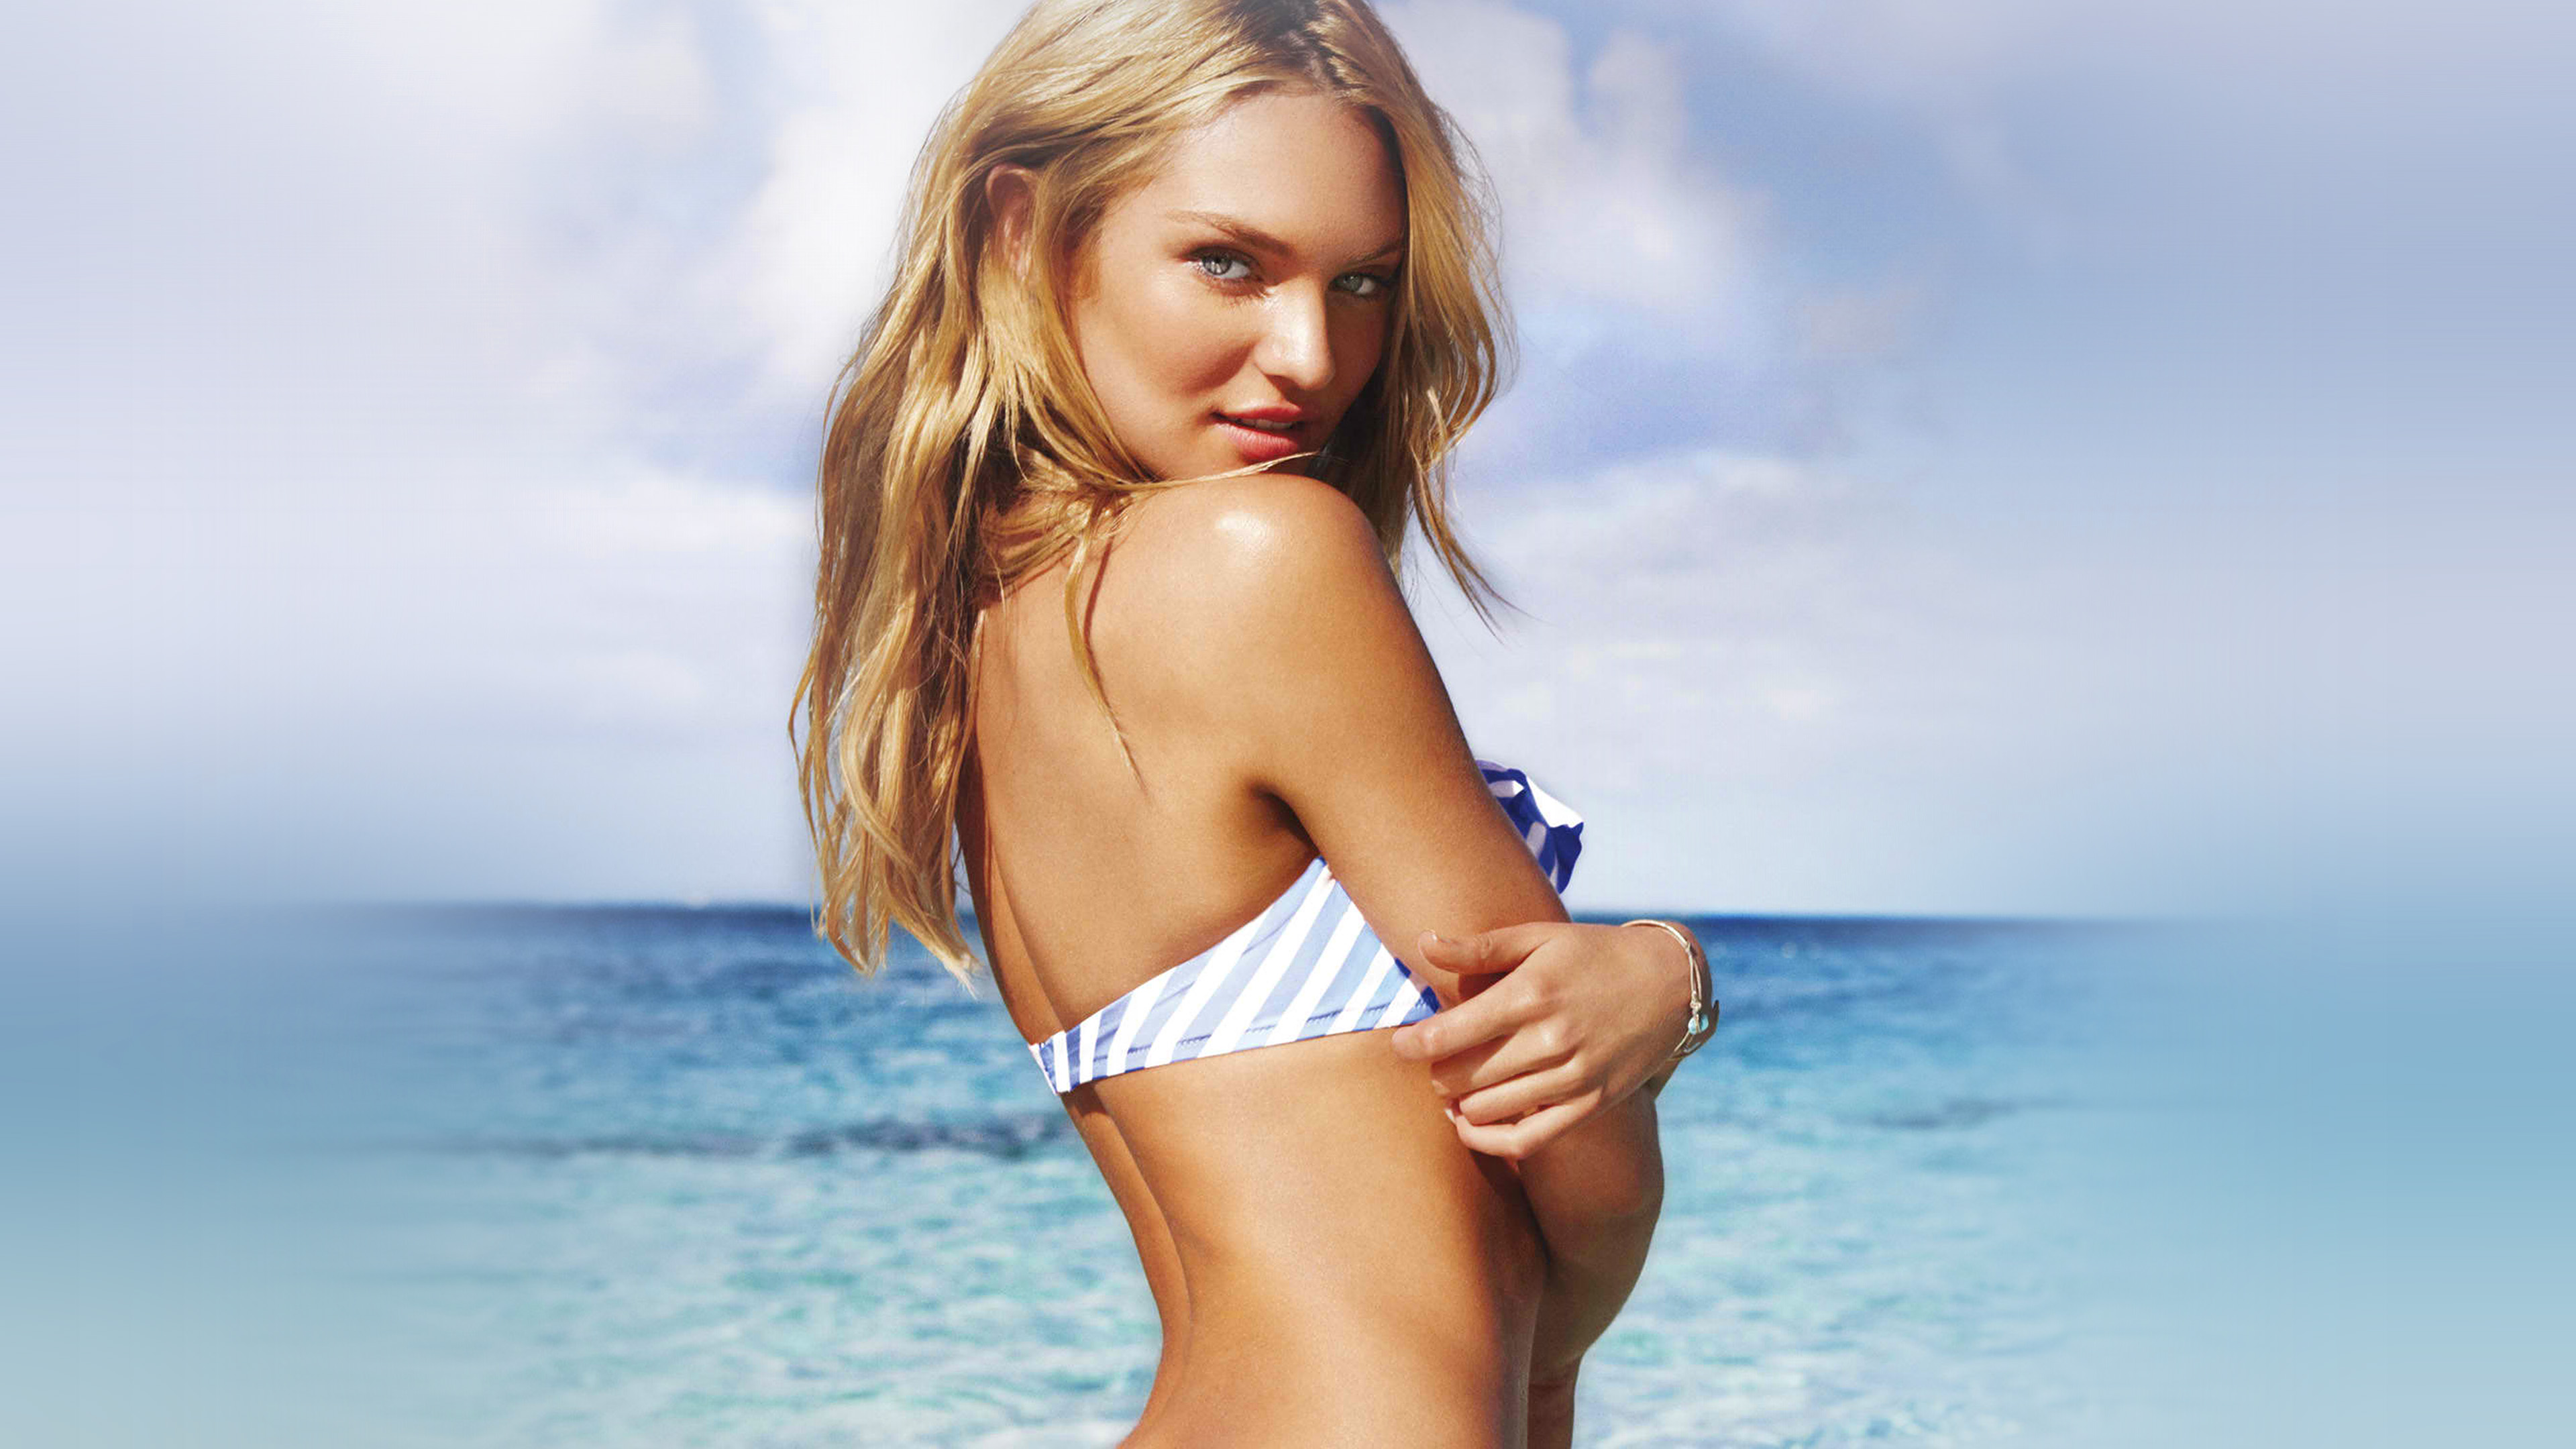 hg08-angel-victoria-secret-candice-bikini-sexy - papers.co